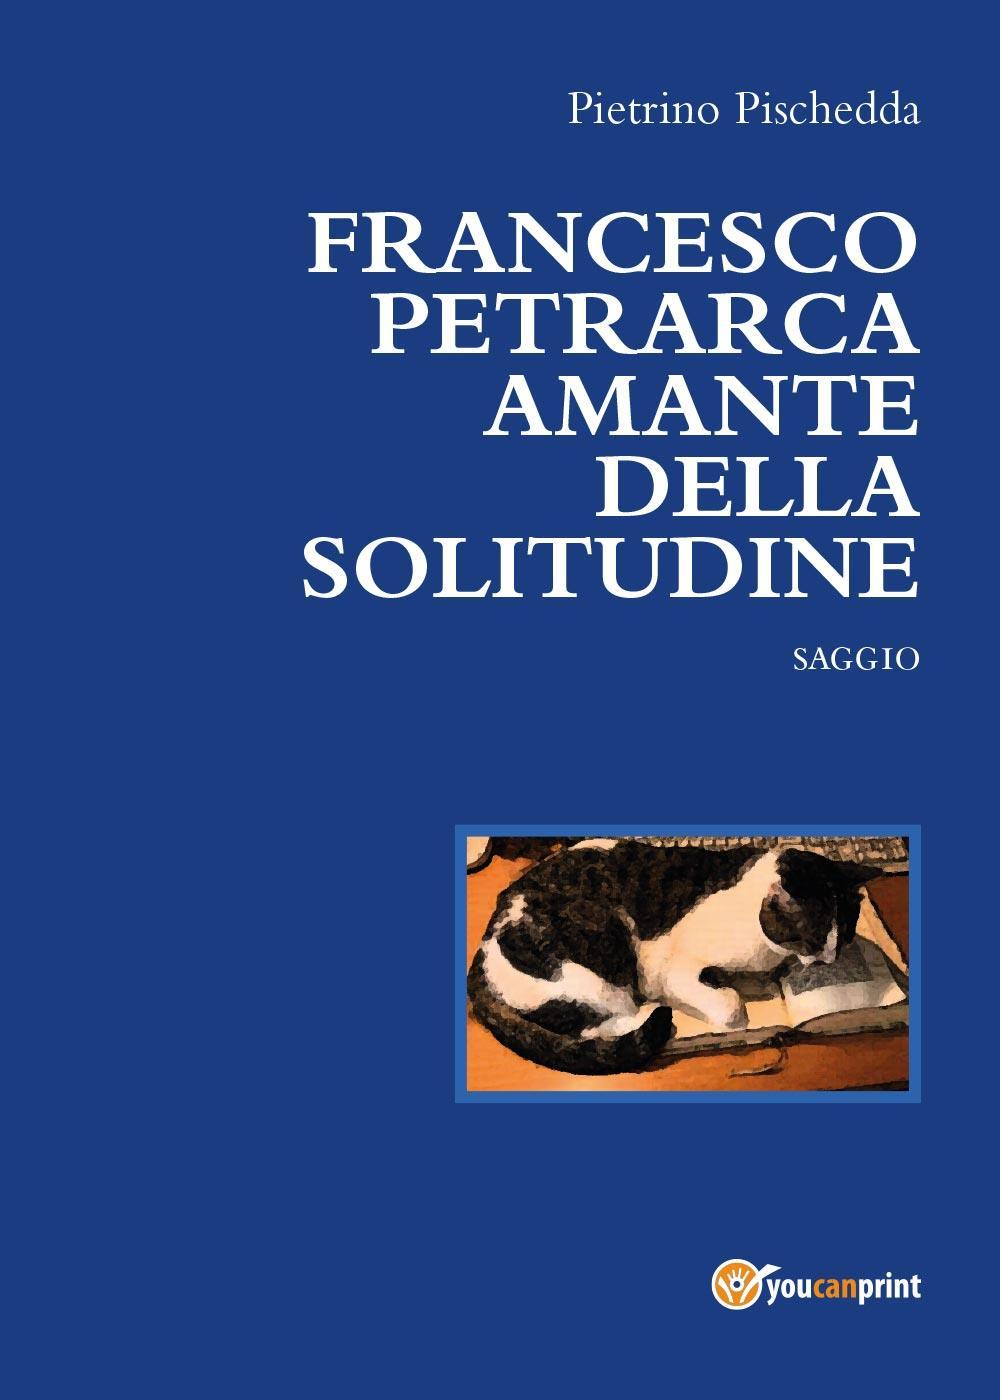 Francesco Petrarca amante della solitudine